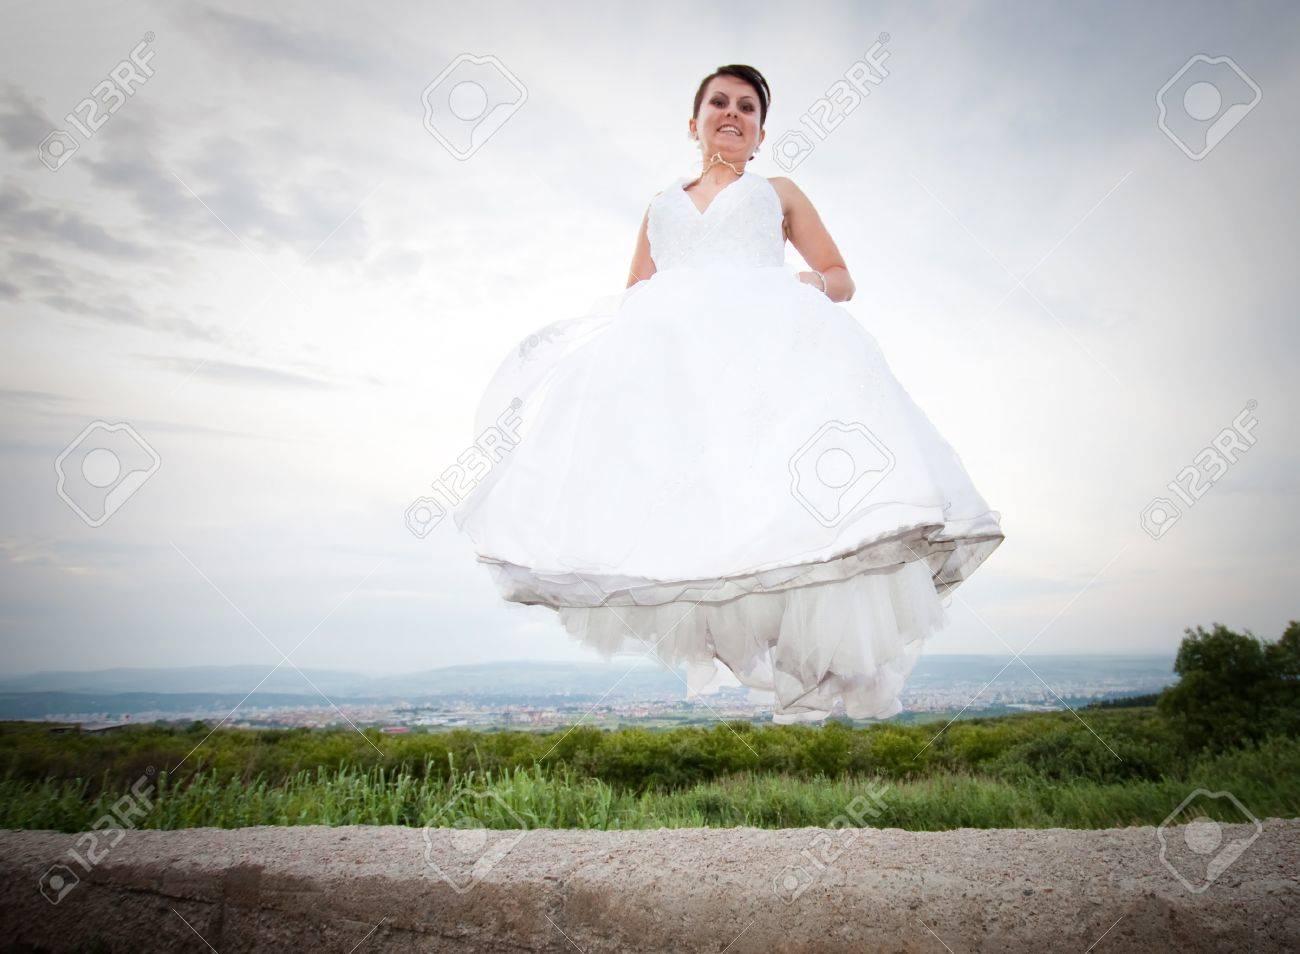 Happy bride jumping Stock Photo - 7347999